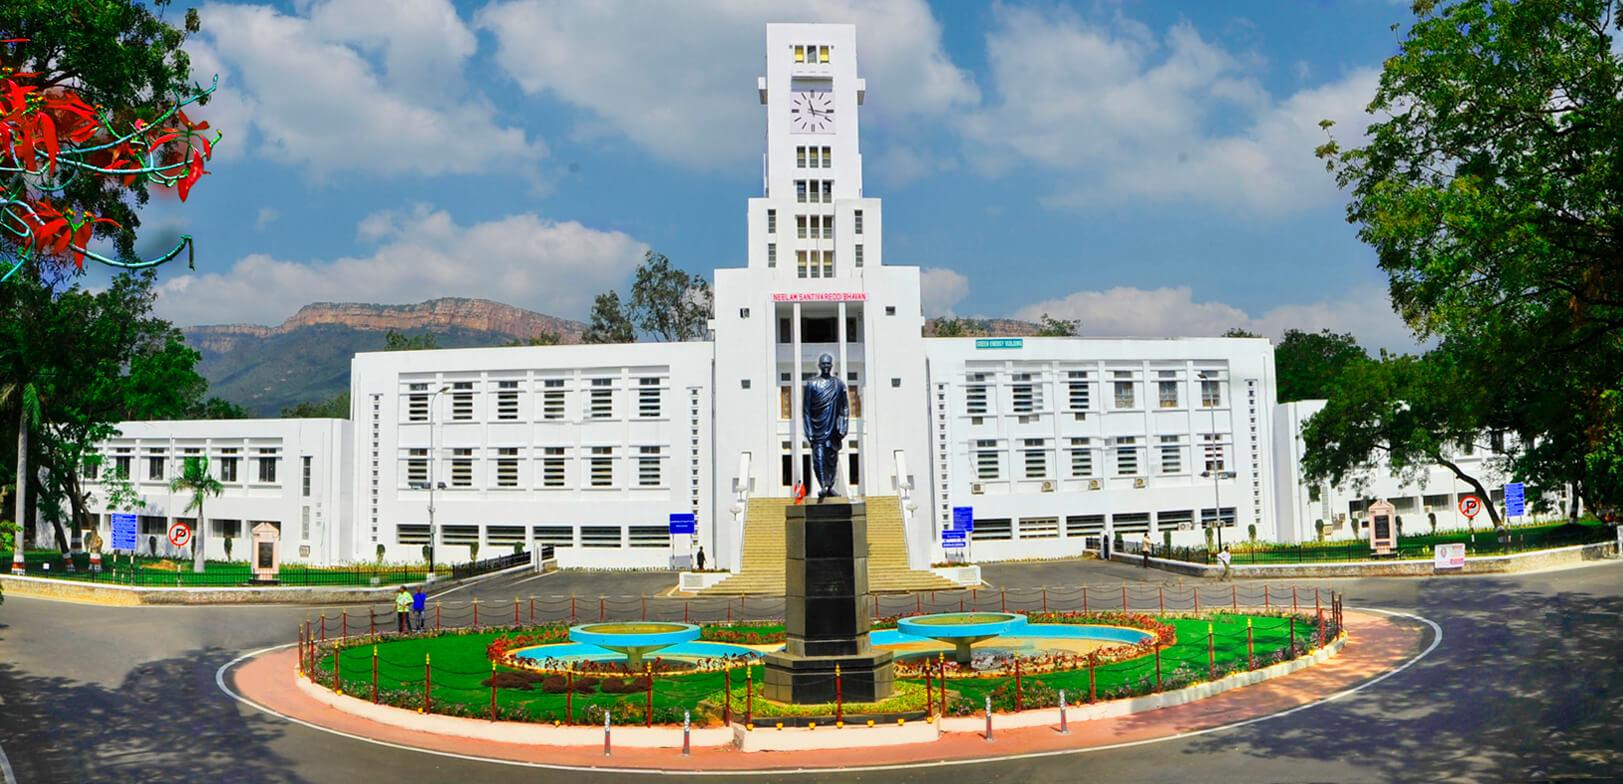 SVU (Sri Venkateswara University)